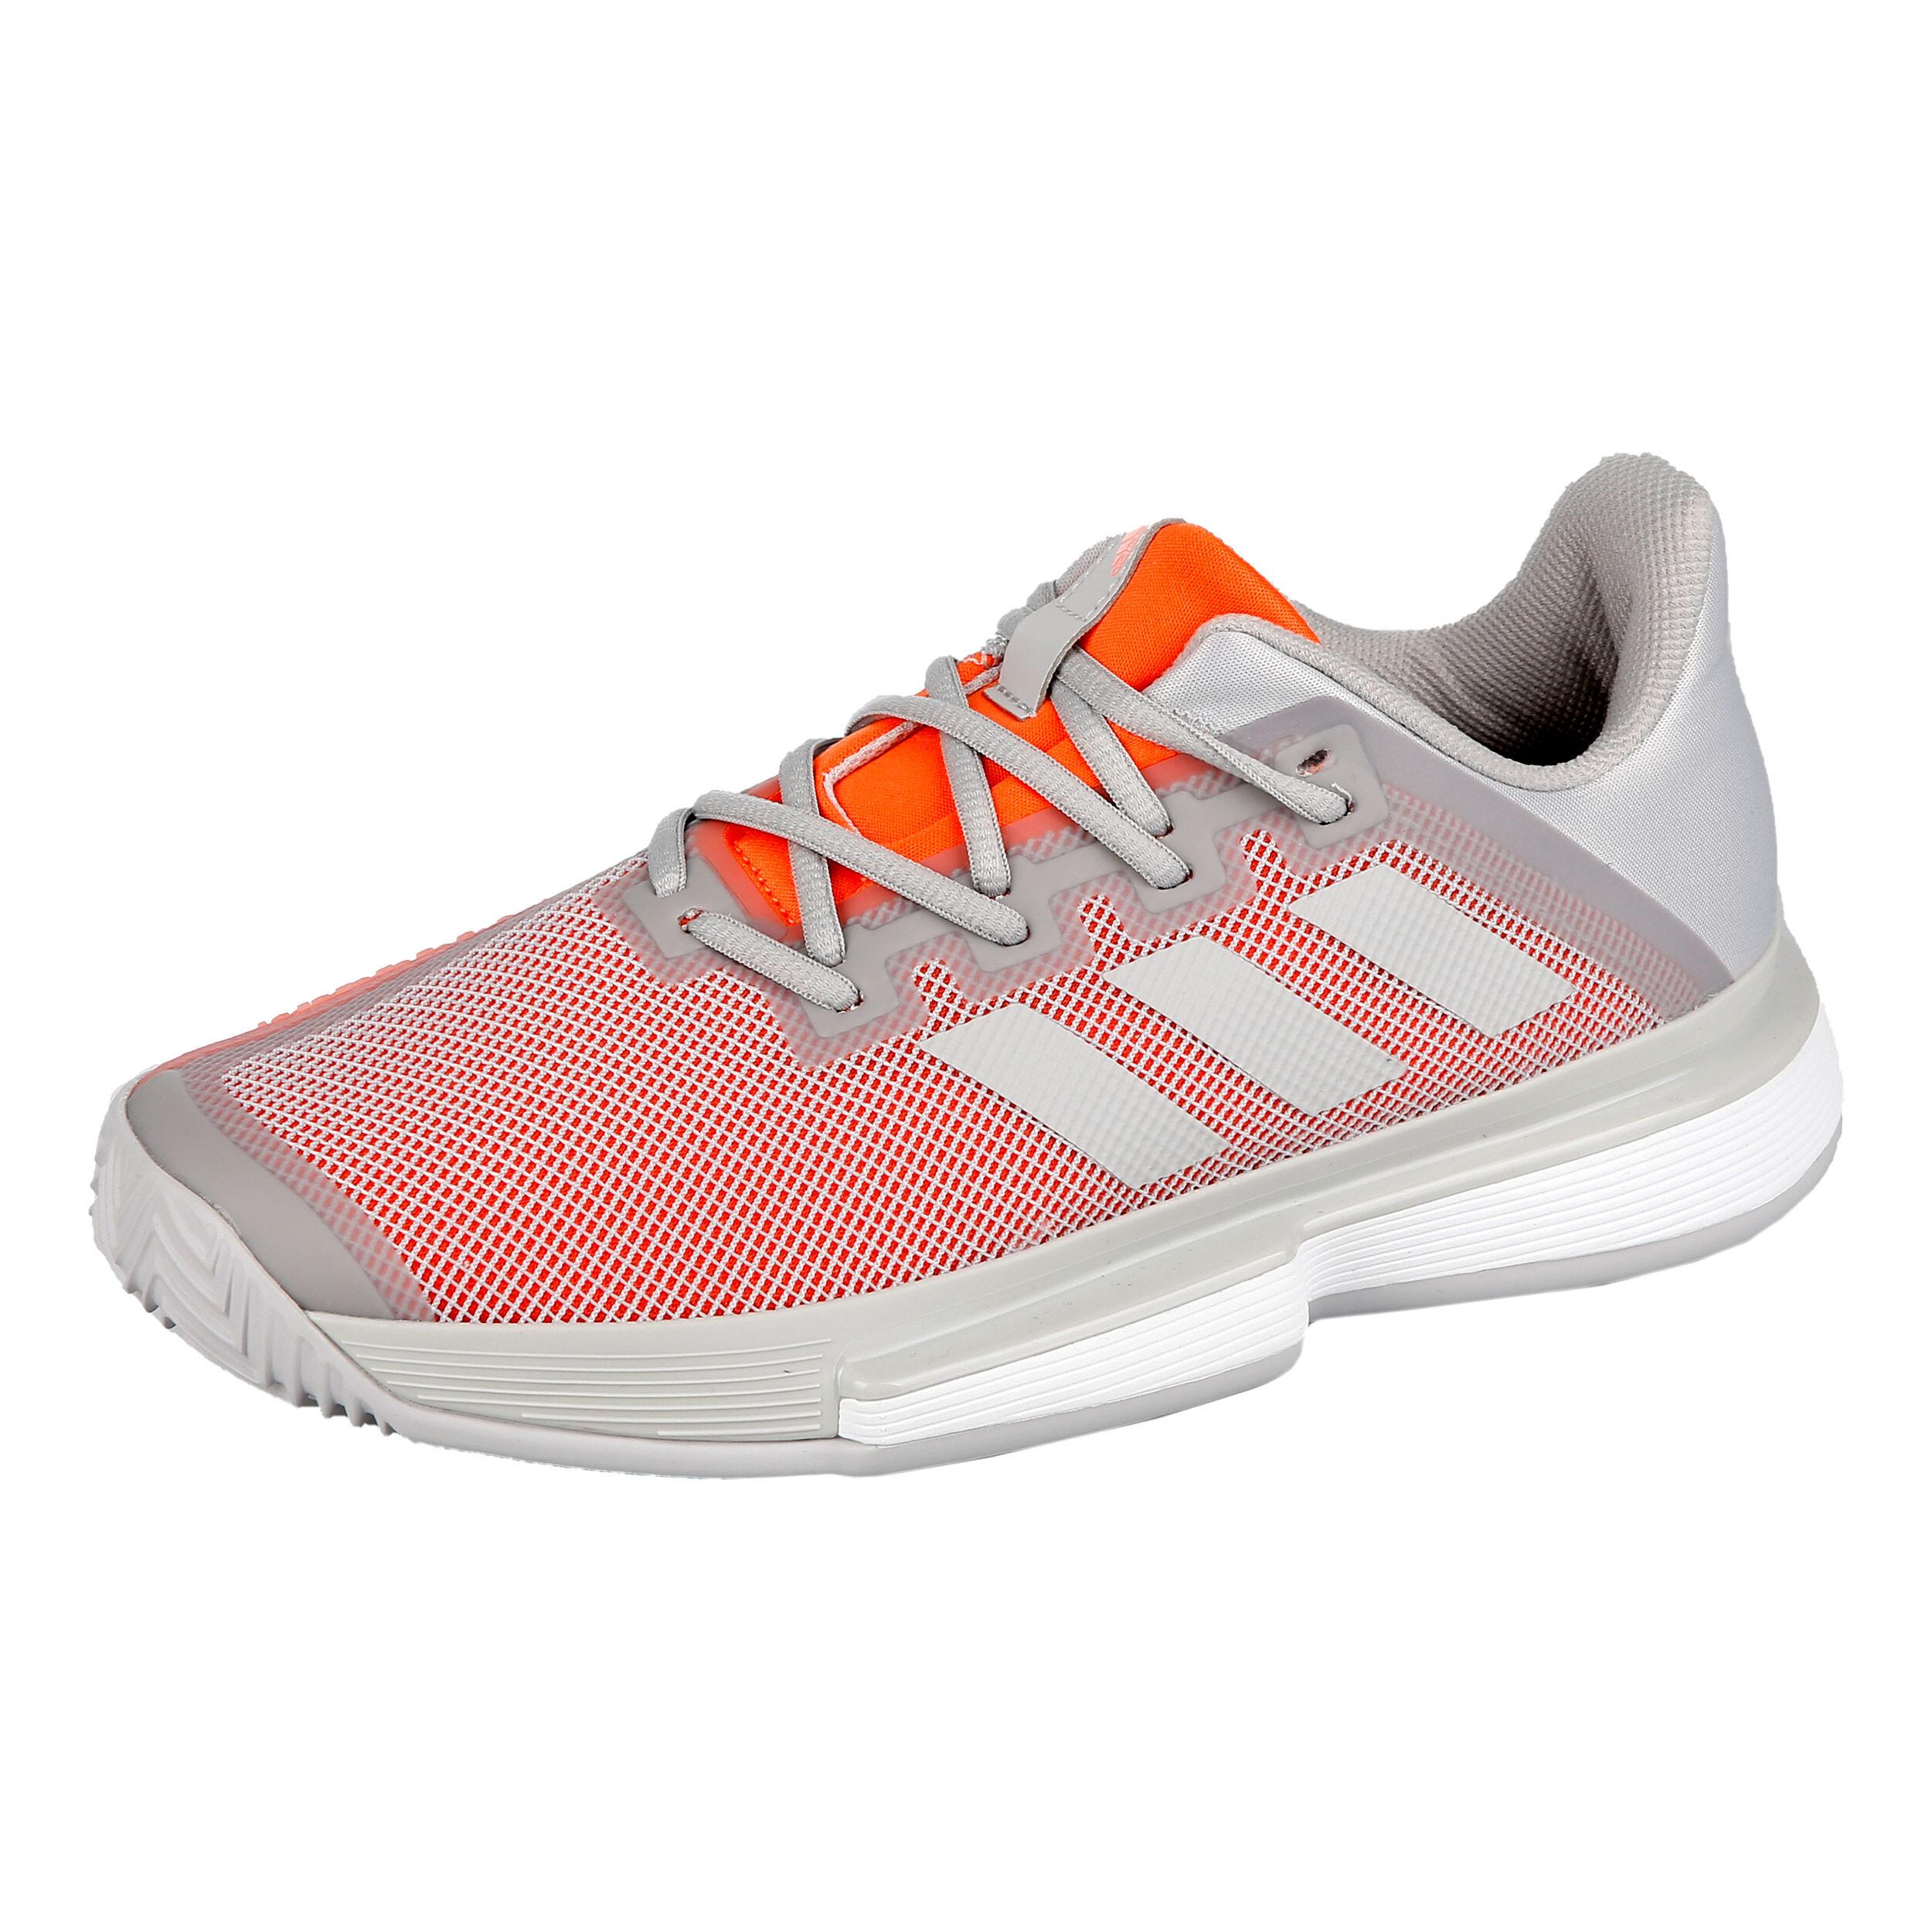 Scarpe da tennis da adidas compra online | Tennis Point